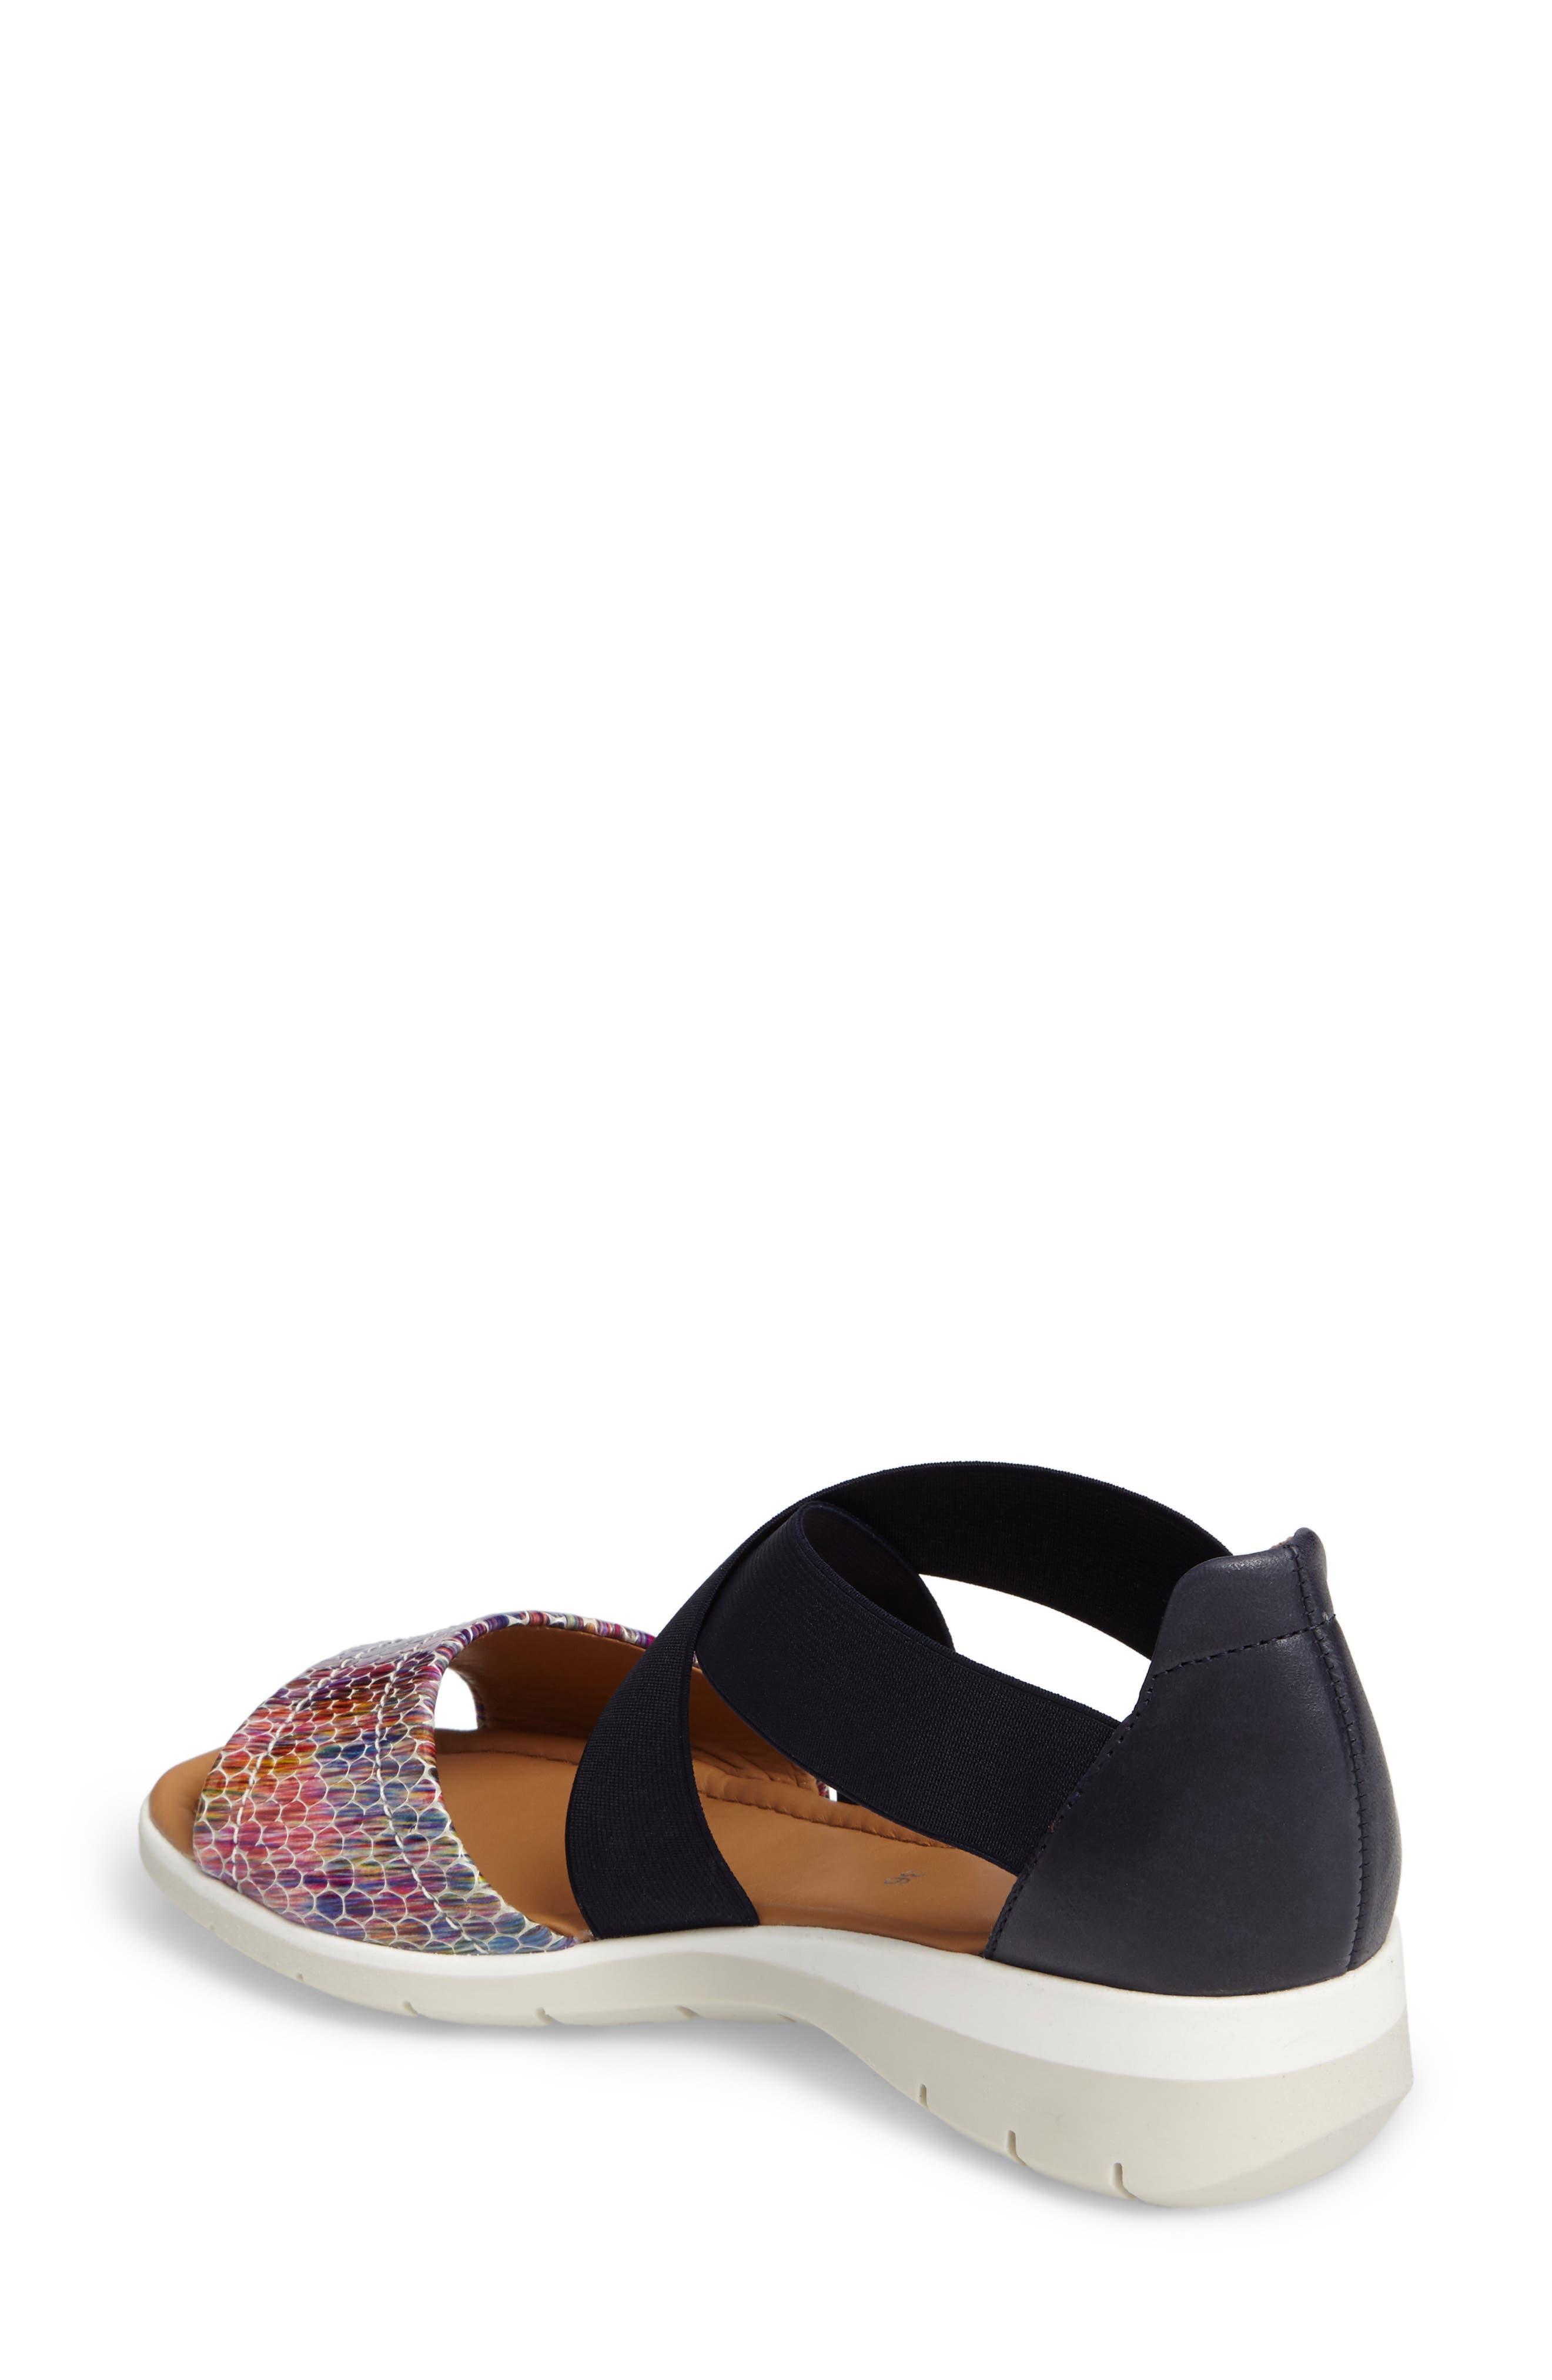 Larissa Cross Strap Wedge Sandal,                             Alternate thumbnail 2, color,                             BLACK MULTI LEATHER